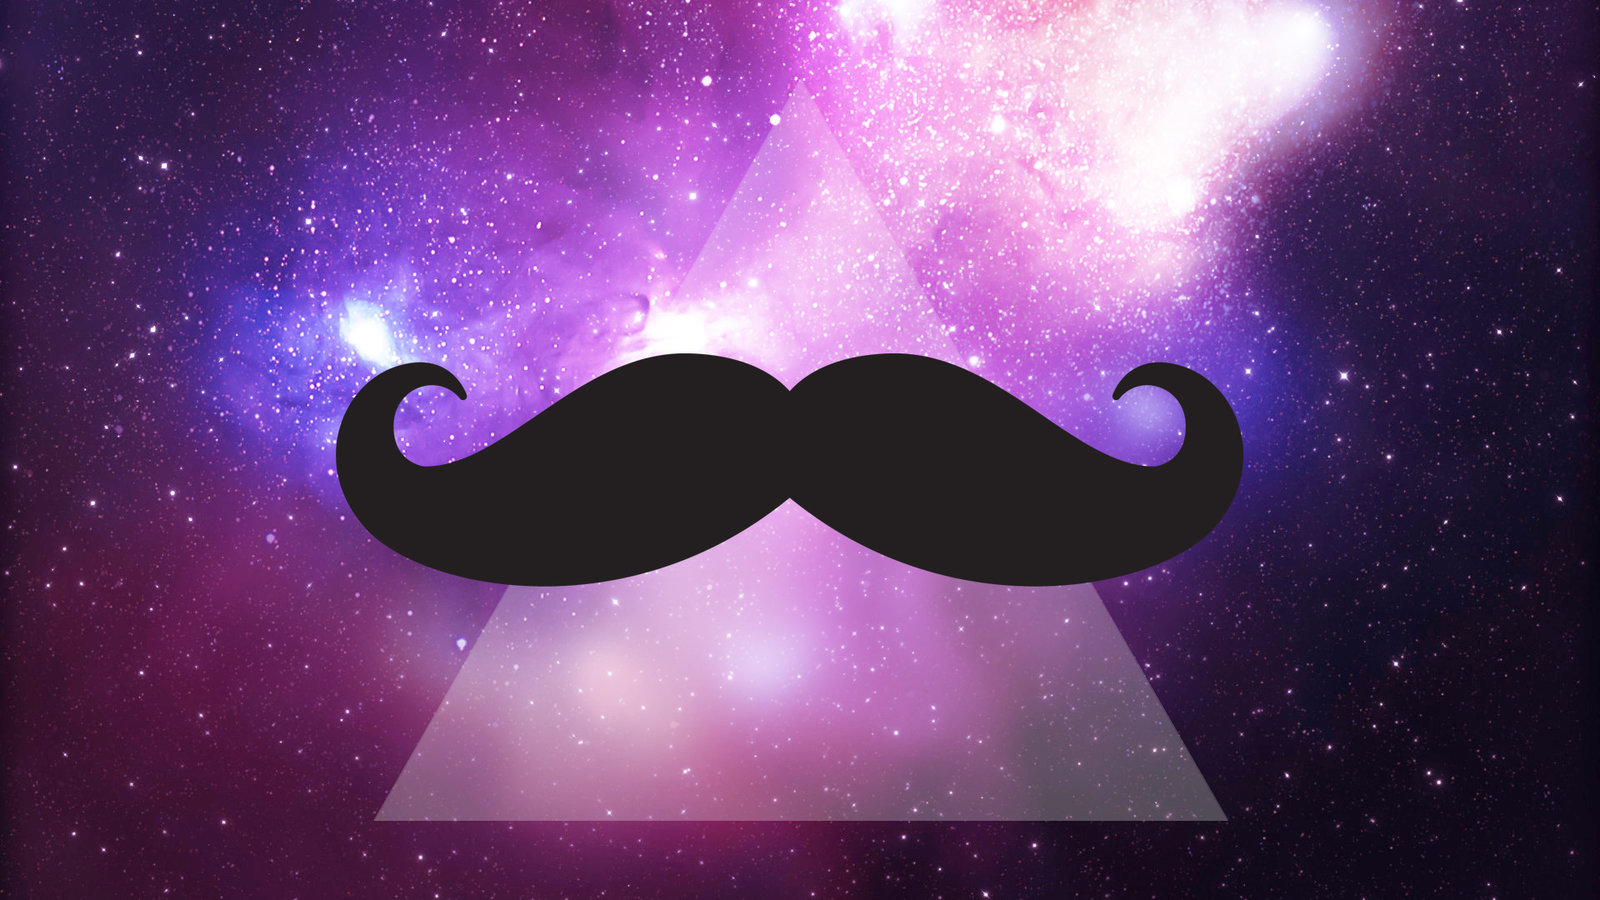 Cute Girly Mustache Wallpaper Download